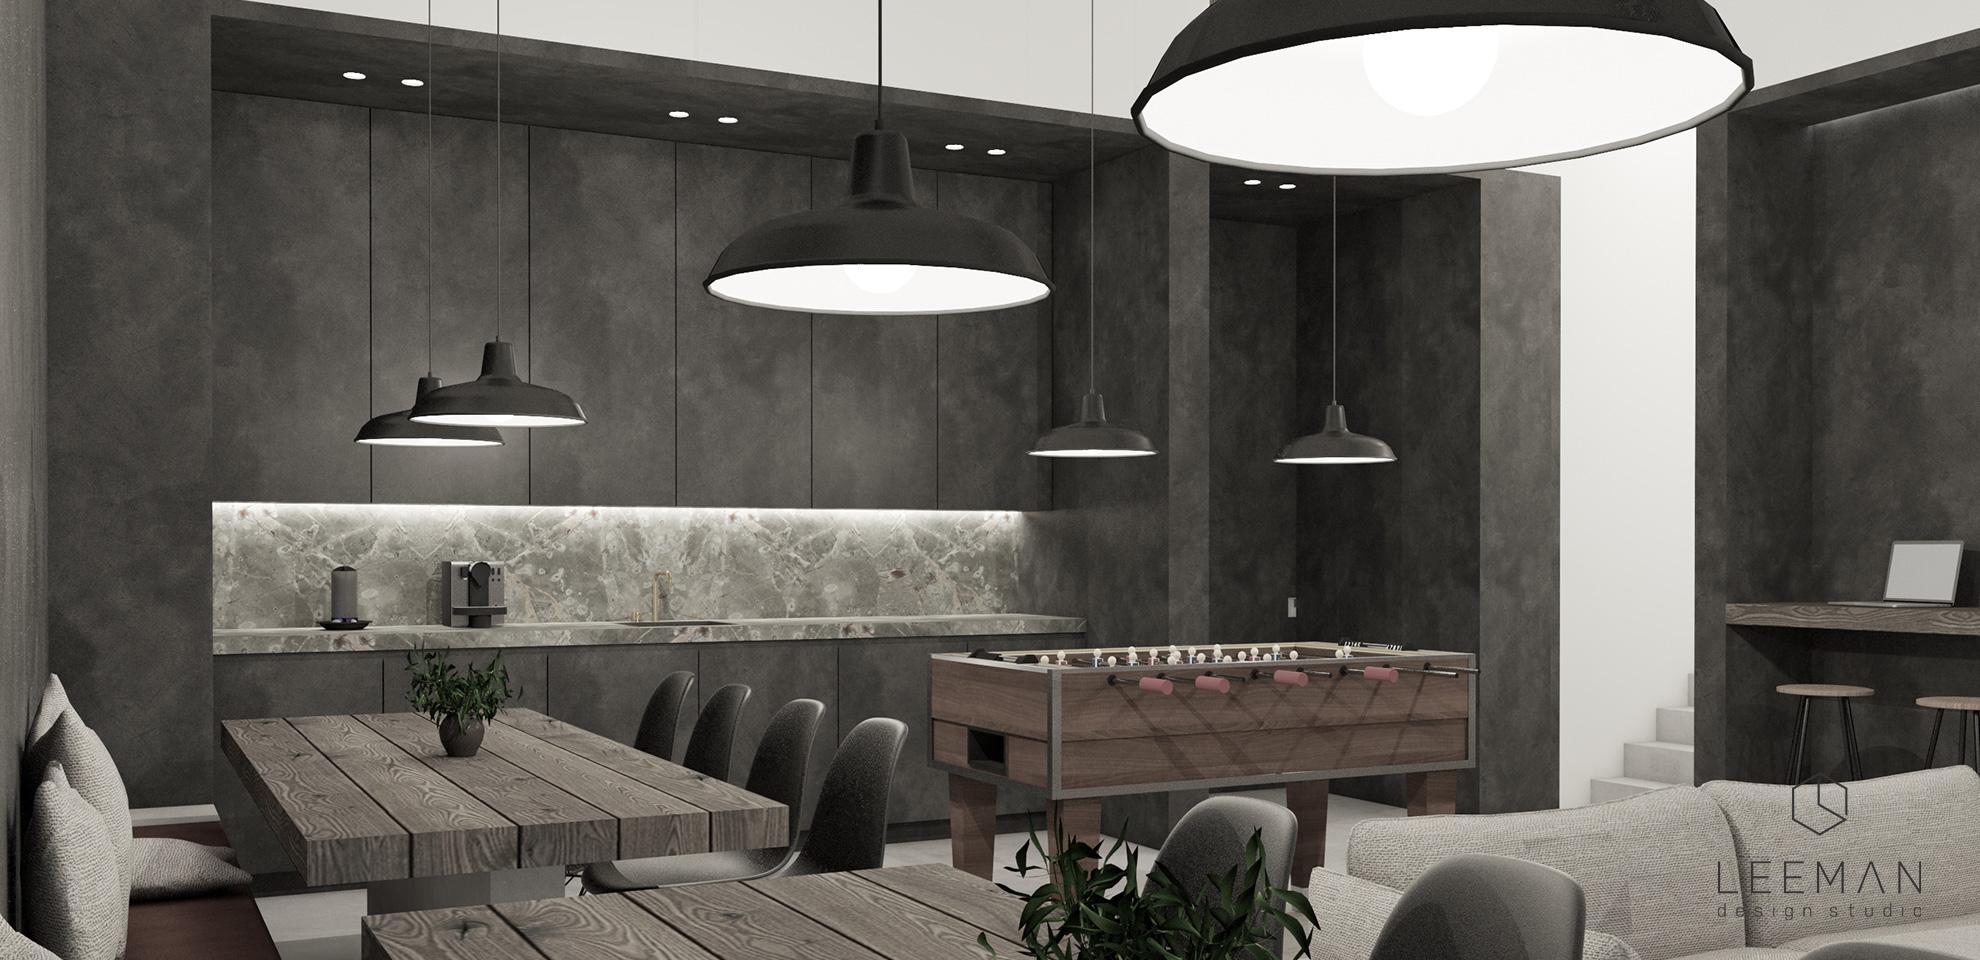 kantine en keuken ontwerp van het sterkens kantoor